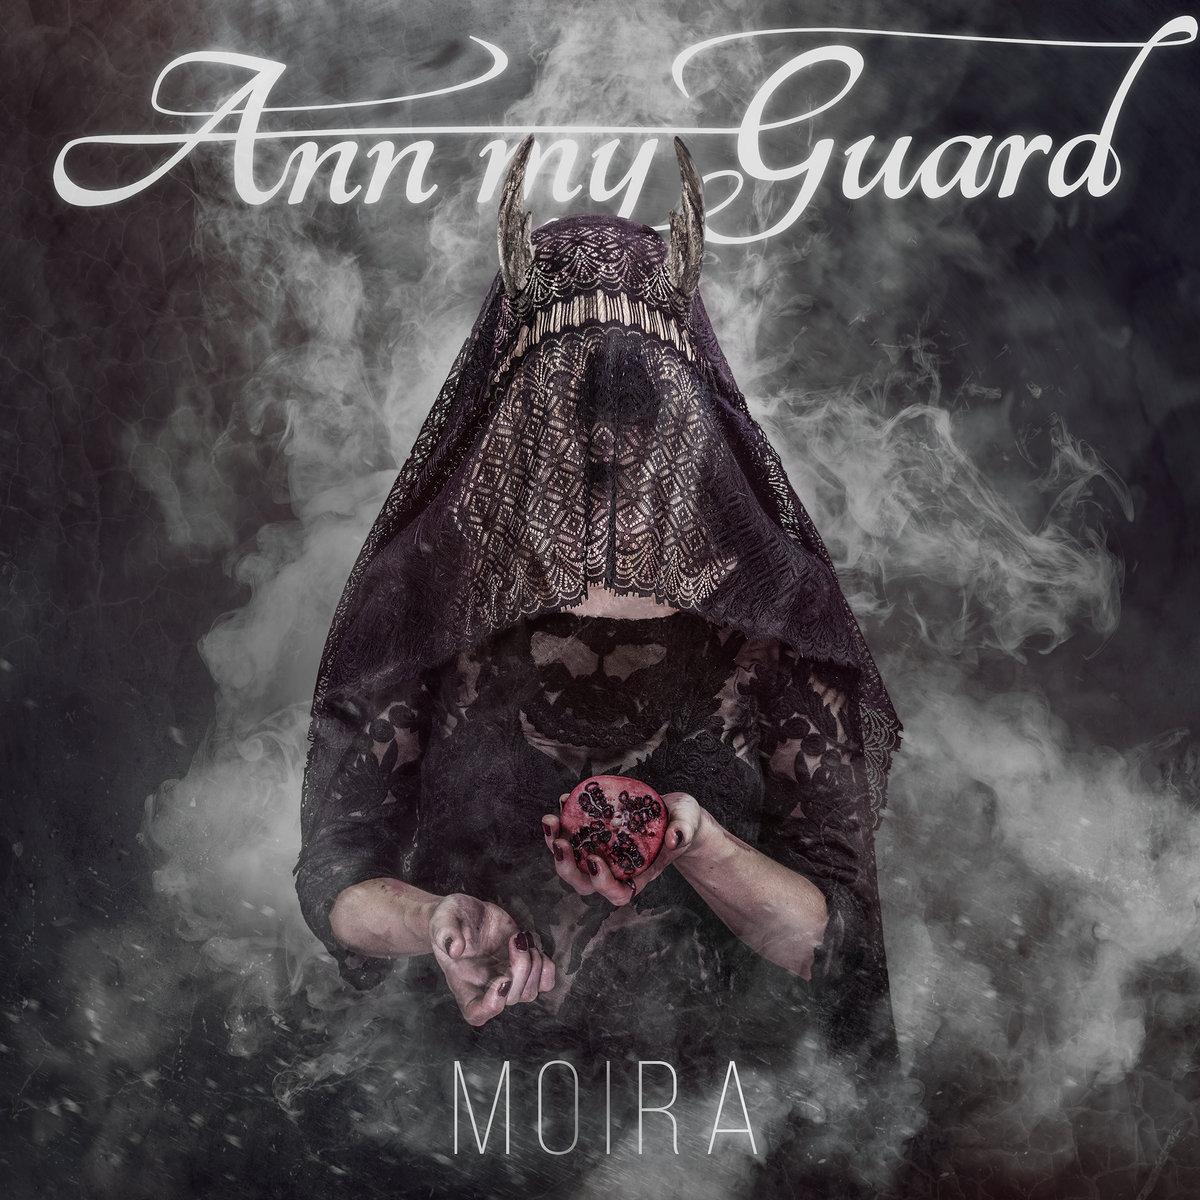 Ann My Guard Moira